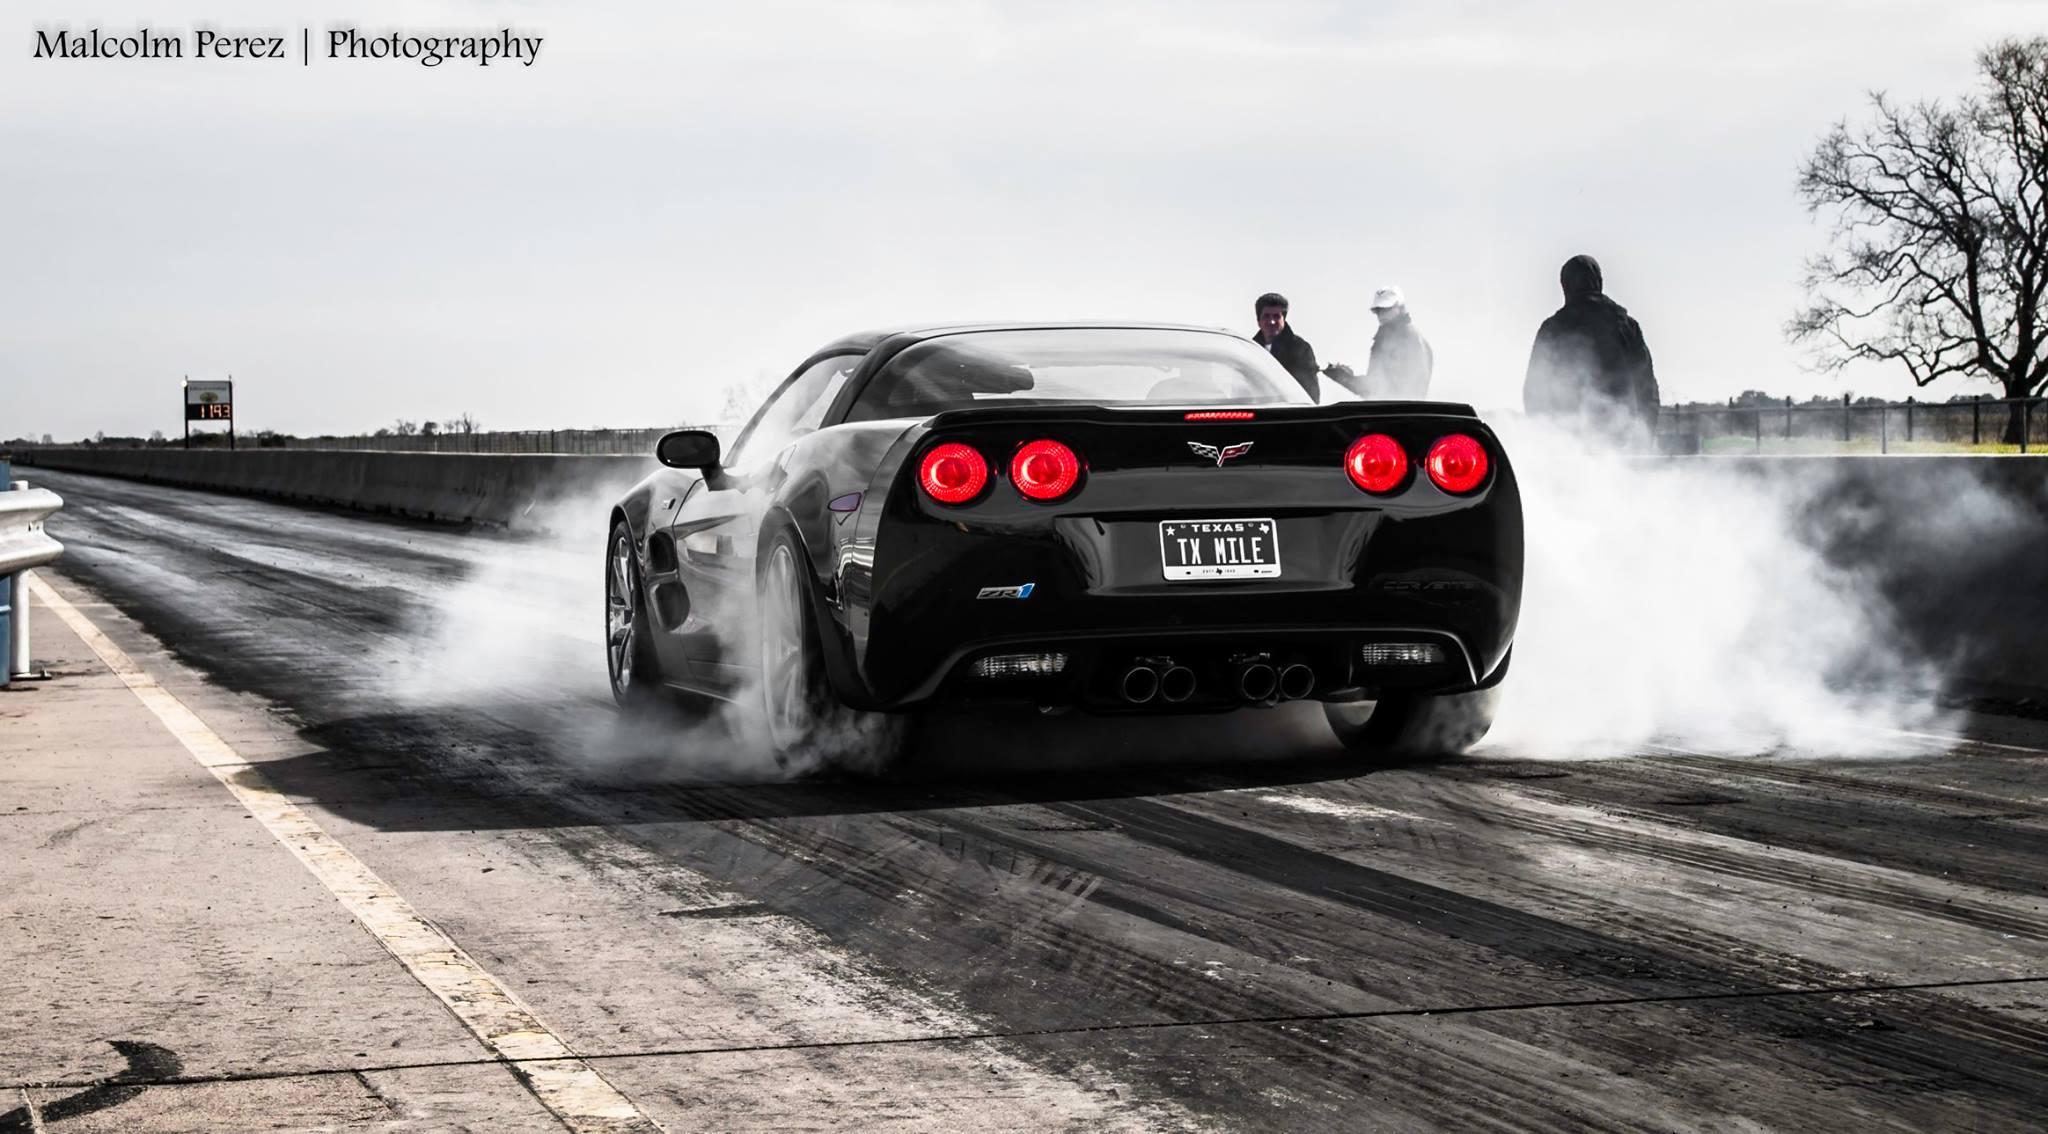 Car Burnout Live Wallpaper 2015 Corvette Z06 Races Challenger Hellcat Viper And